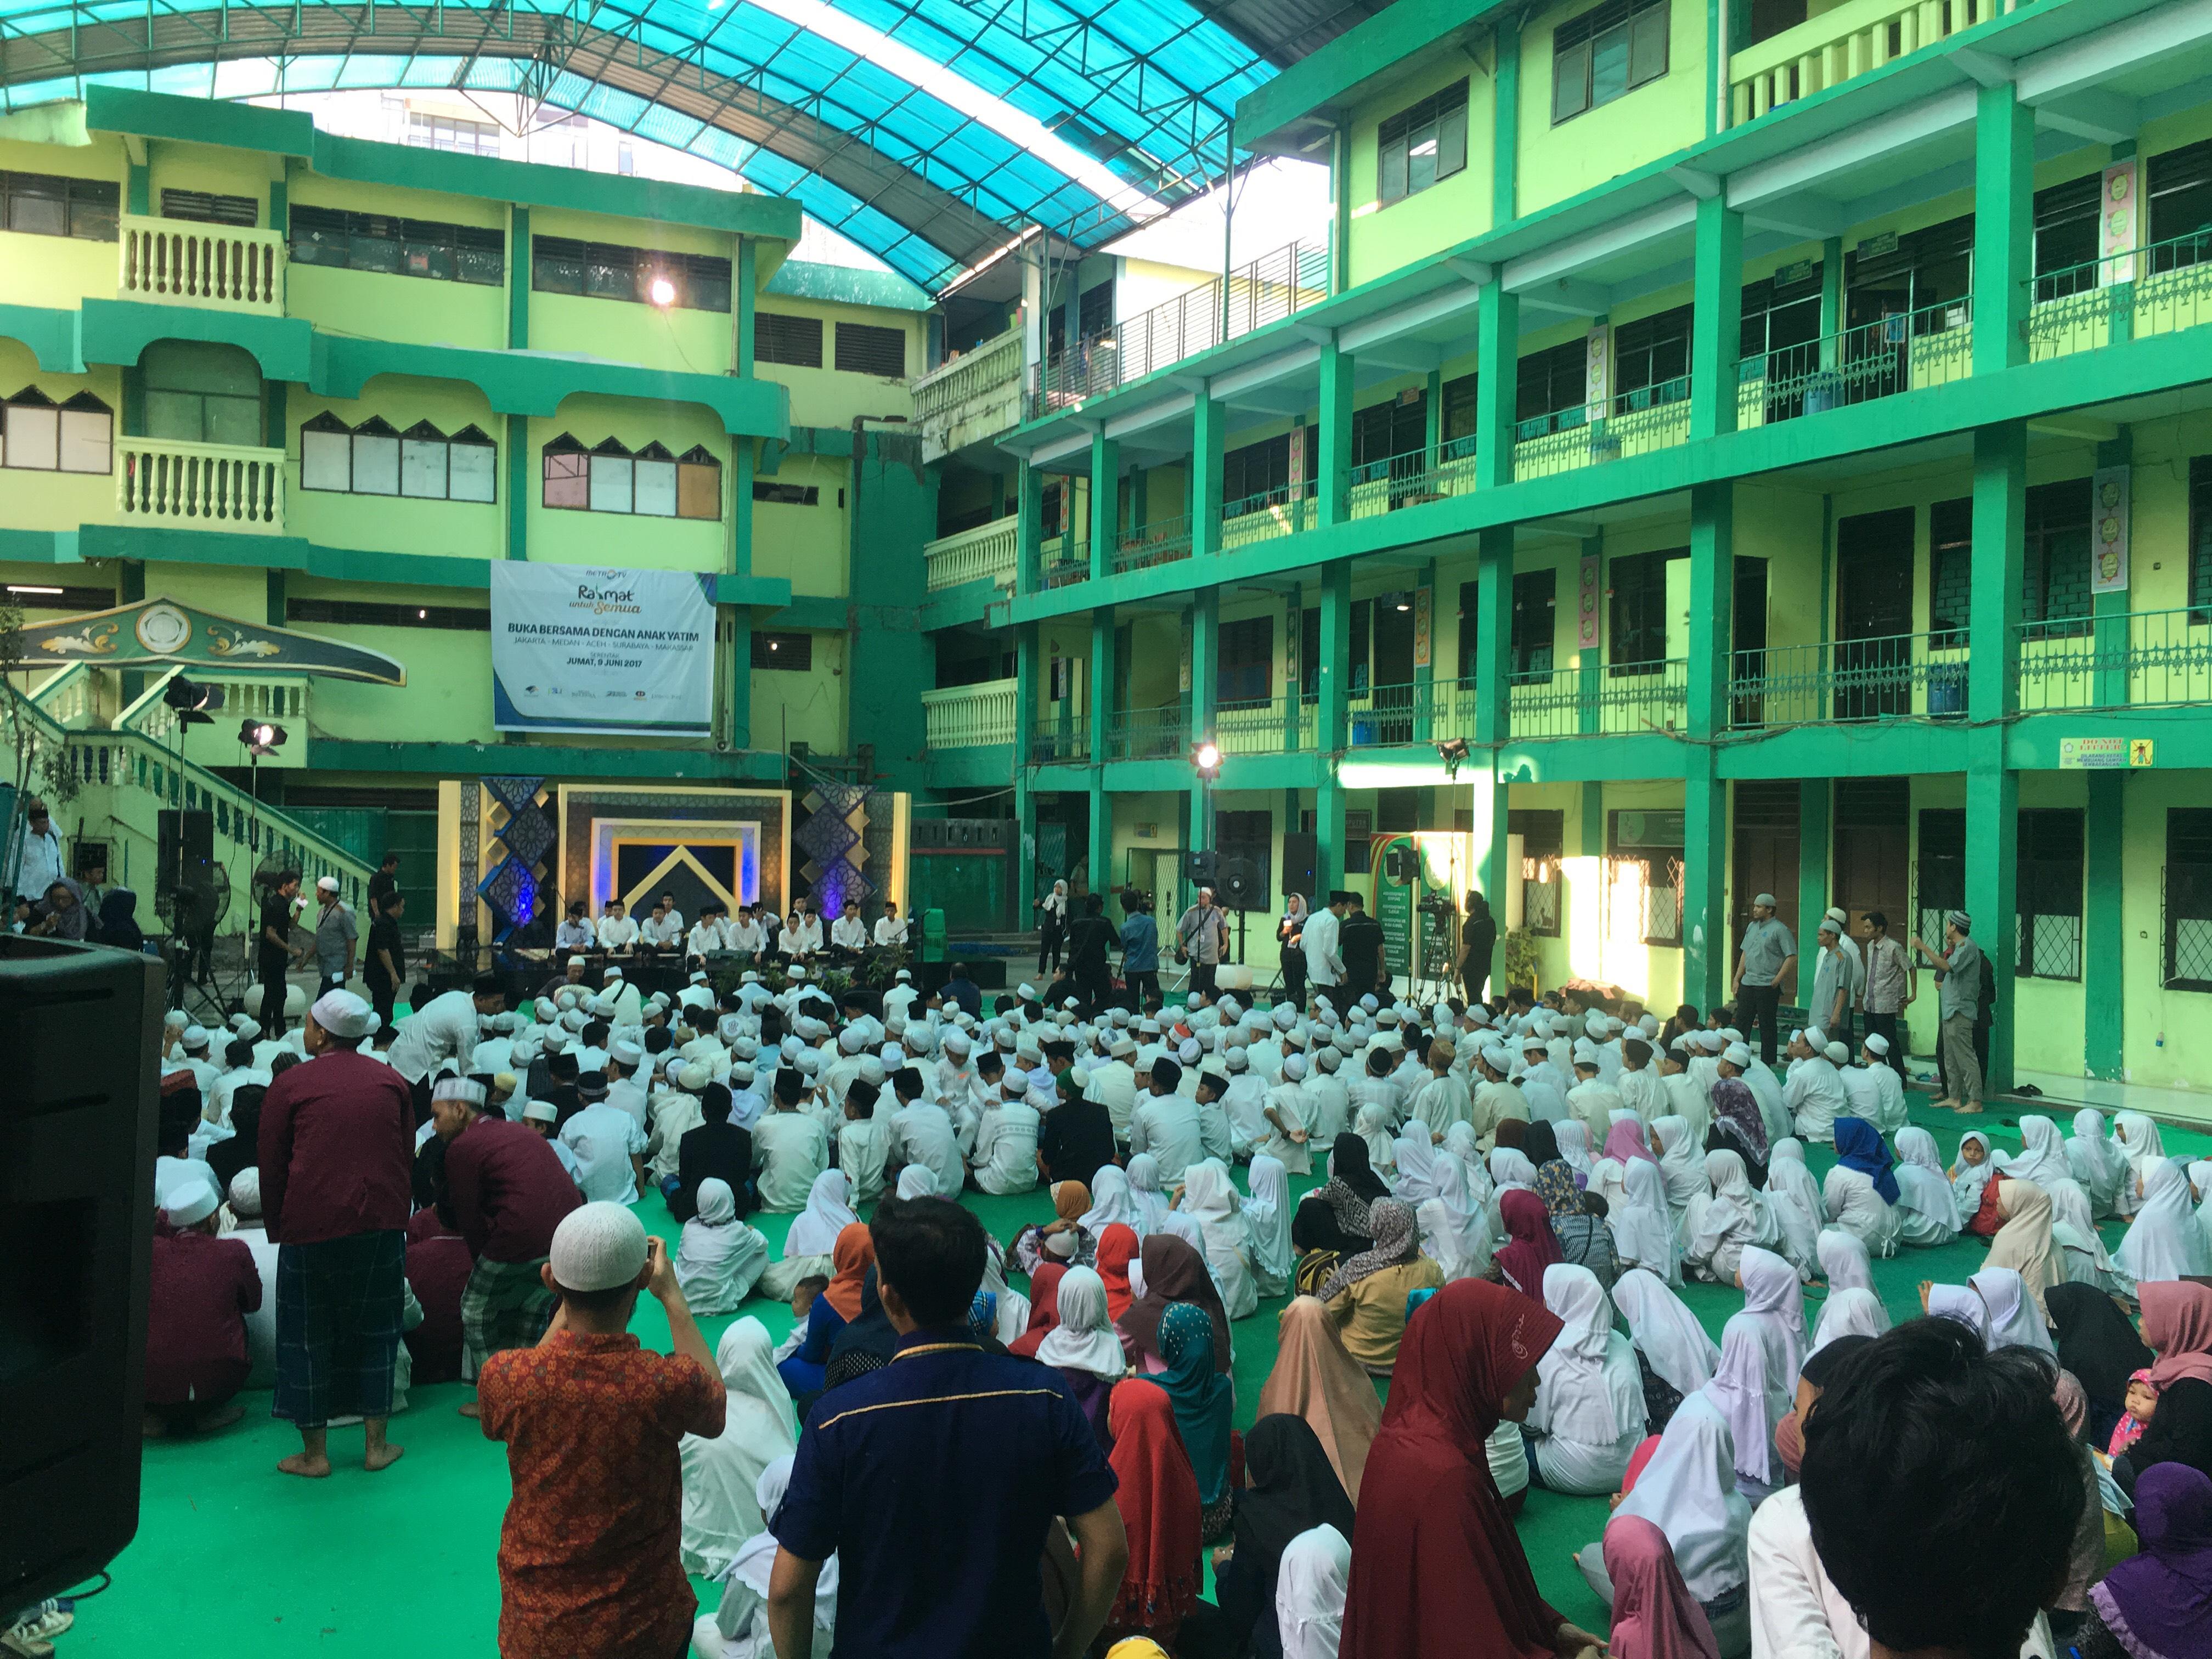 Suasana Buka Puasa Media Group Bersama Anak Yatim di Ponpes Asshiddiqiyah